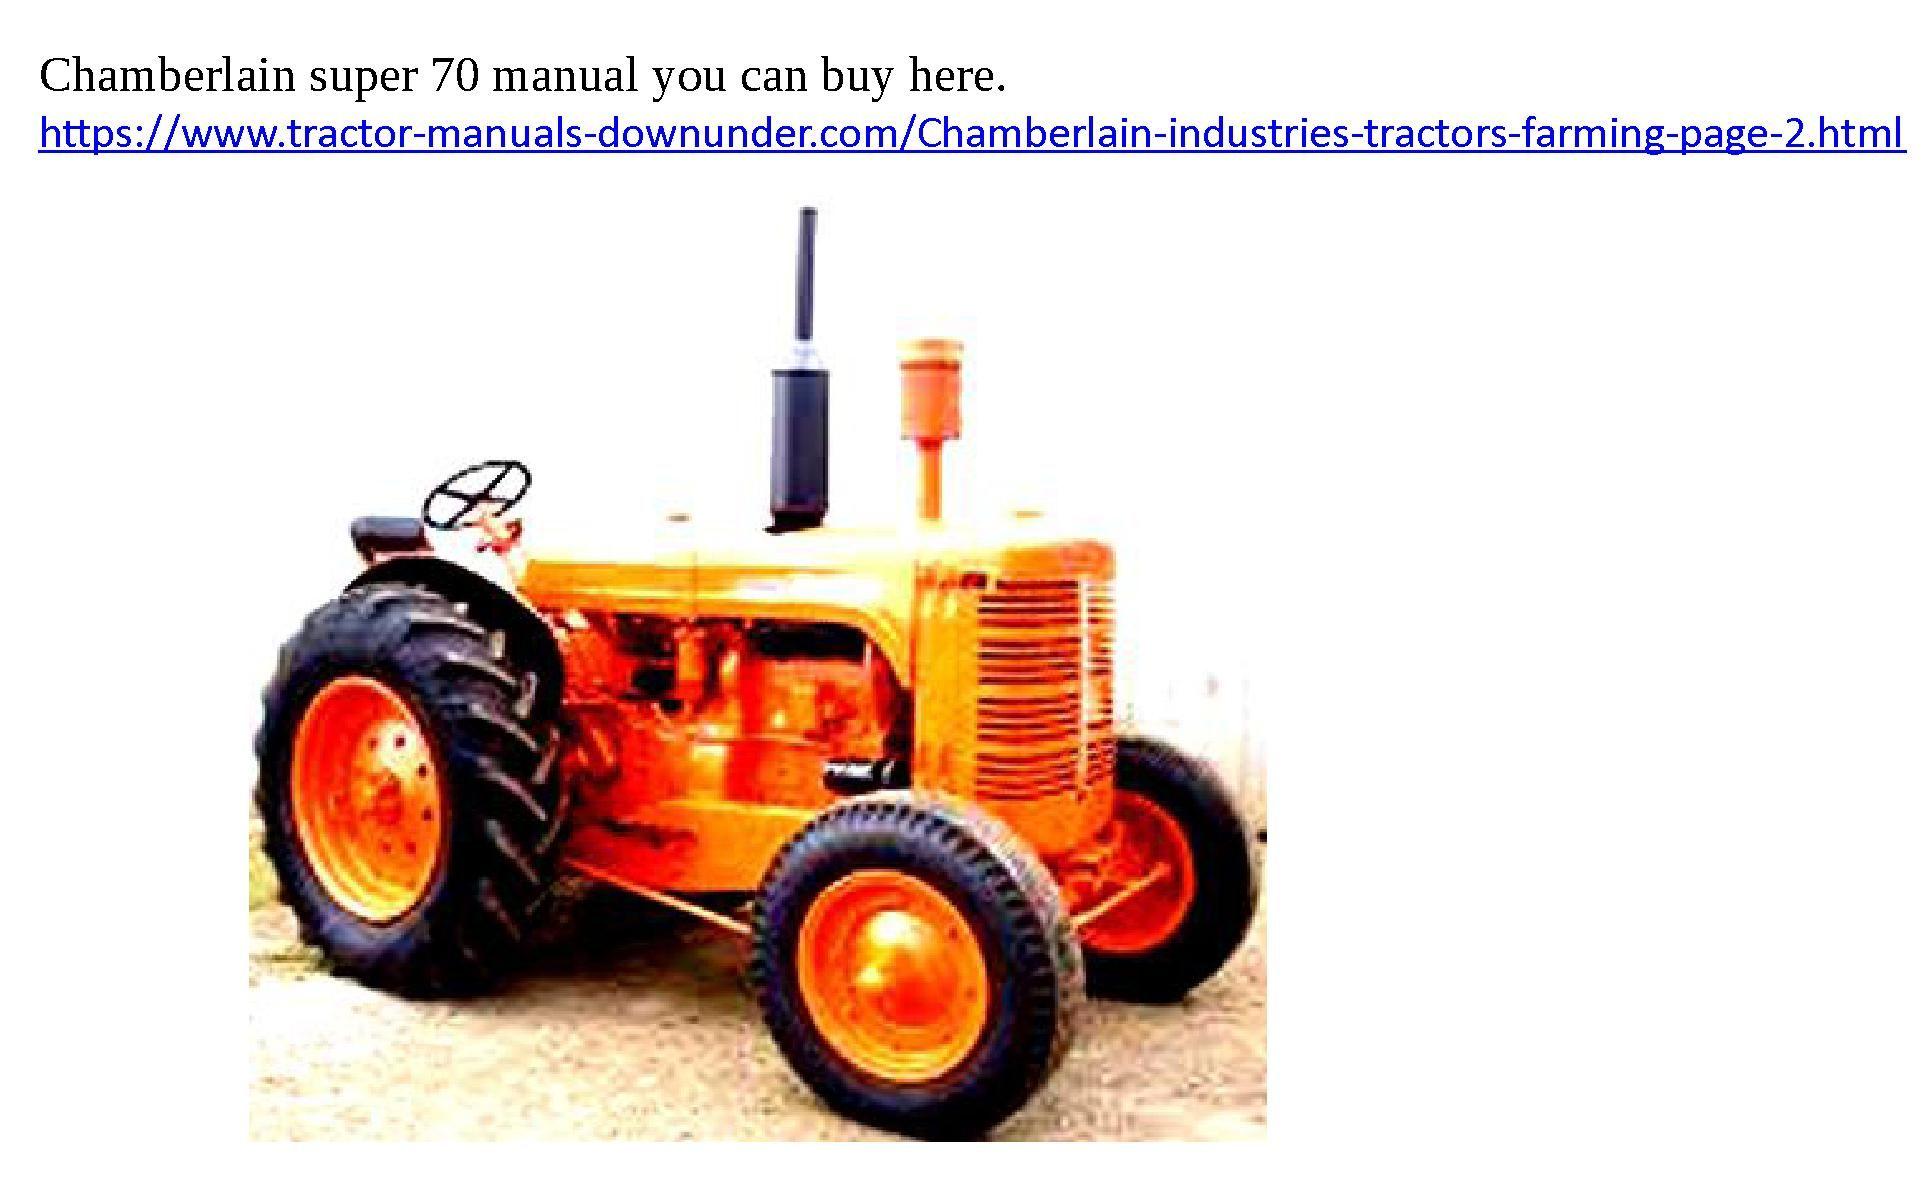 chamberlain super 70 manuals aussie farm power pinterest tractor rh pinterest com chamberlain 4080 operator's manual